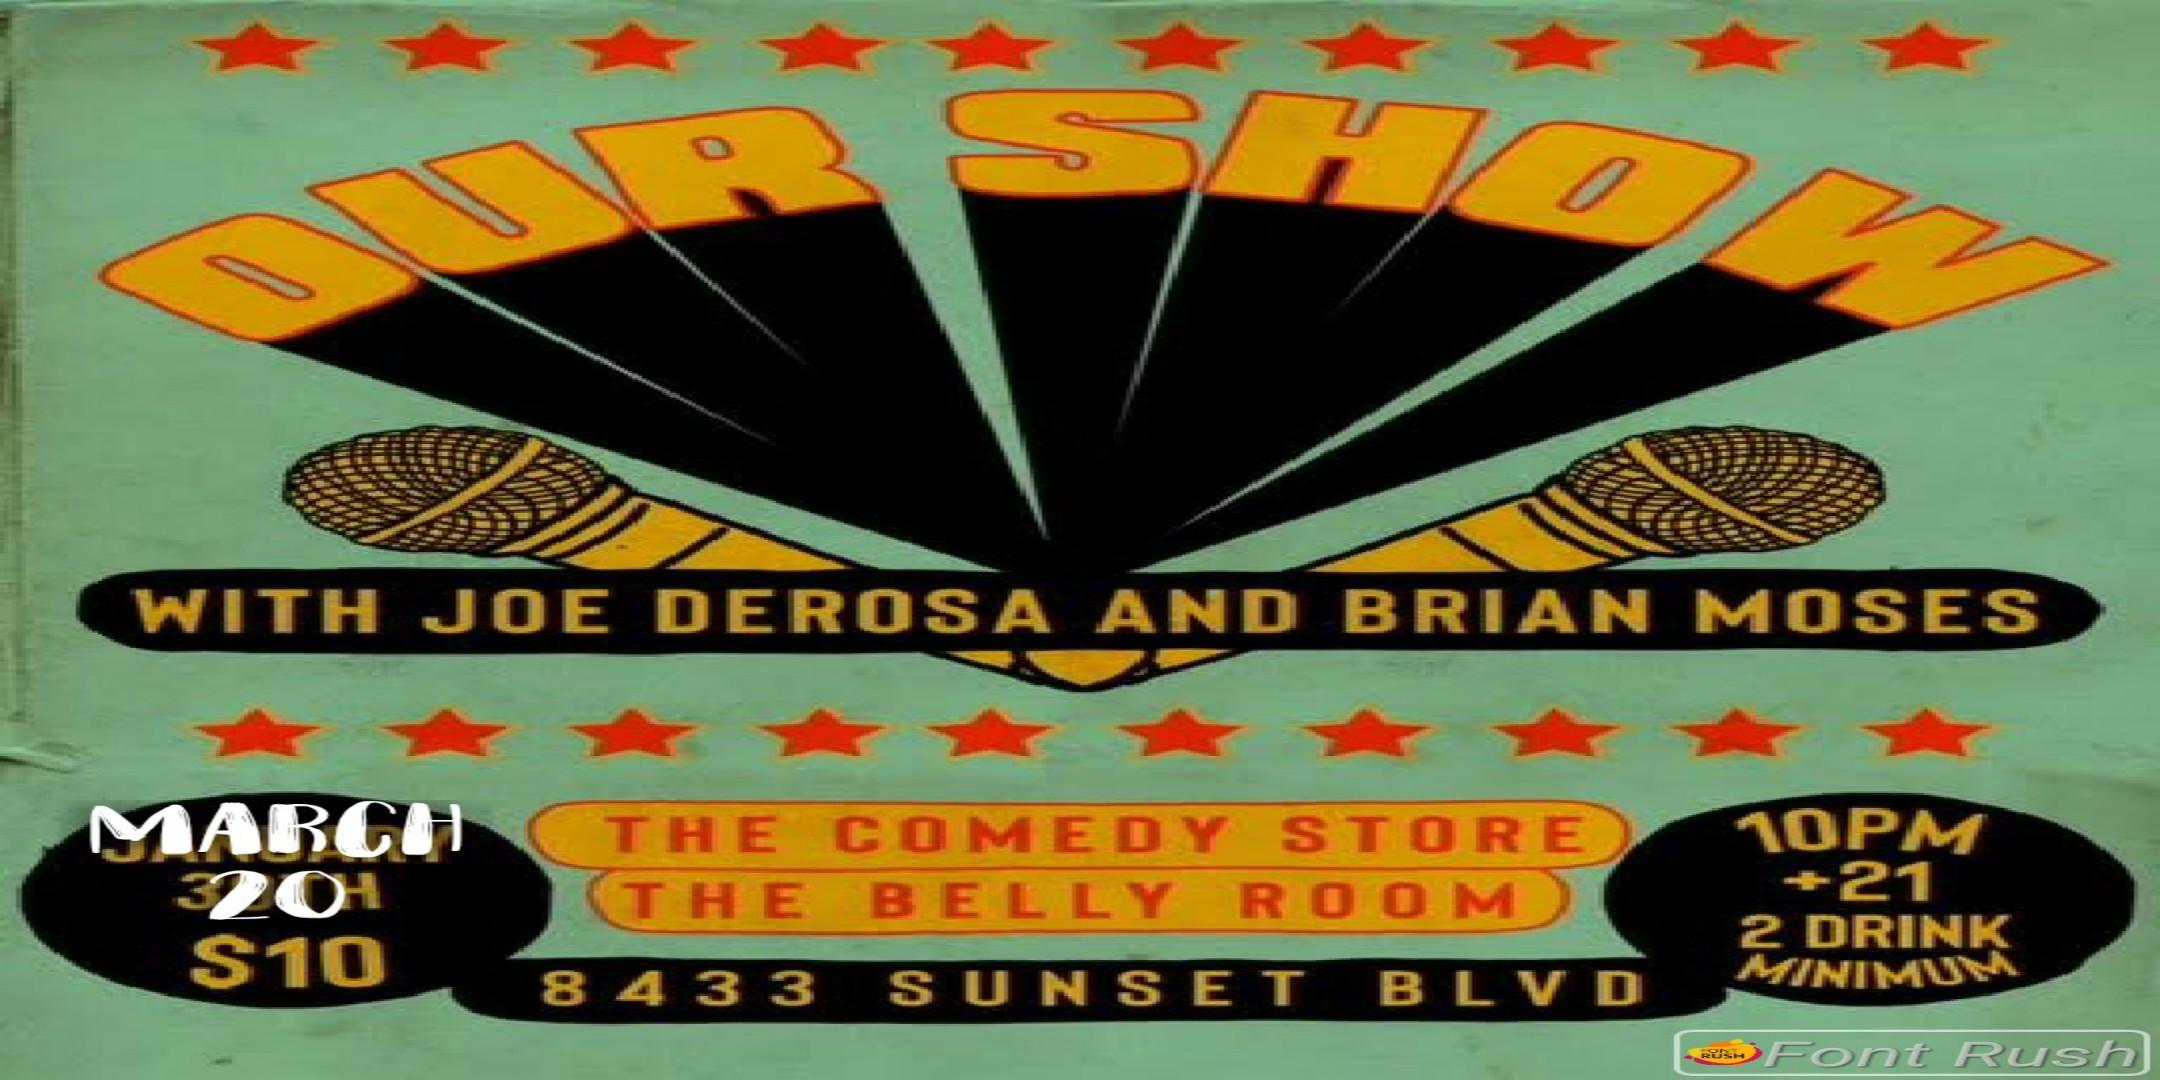 Joe Derosa and Brian Moses Present Our Show